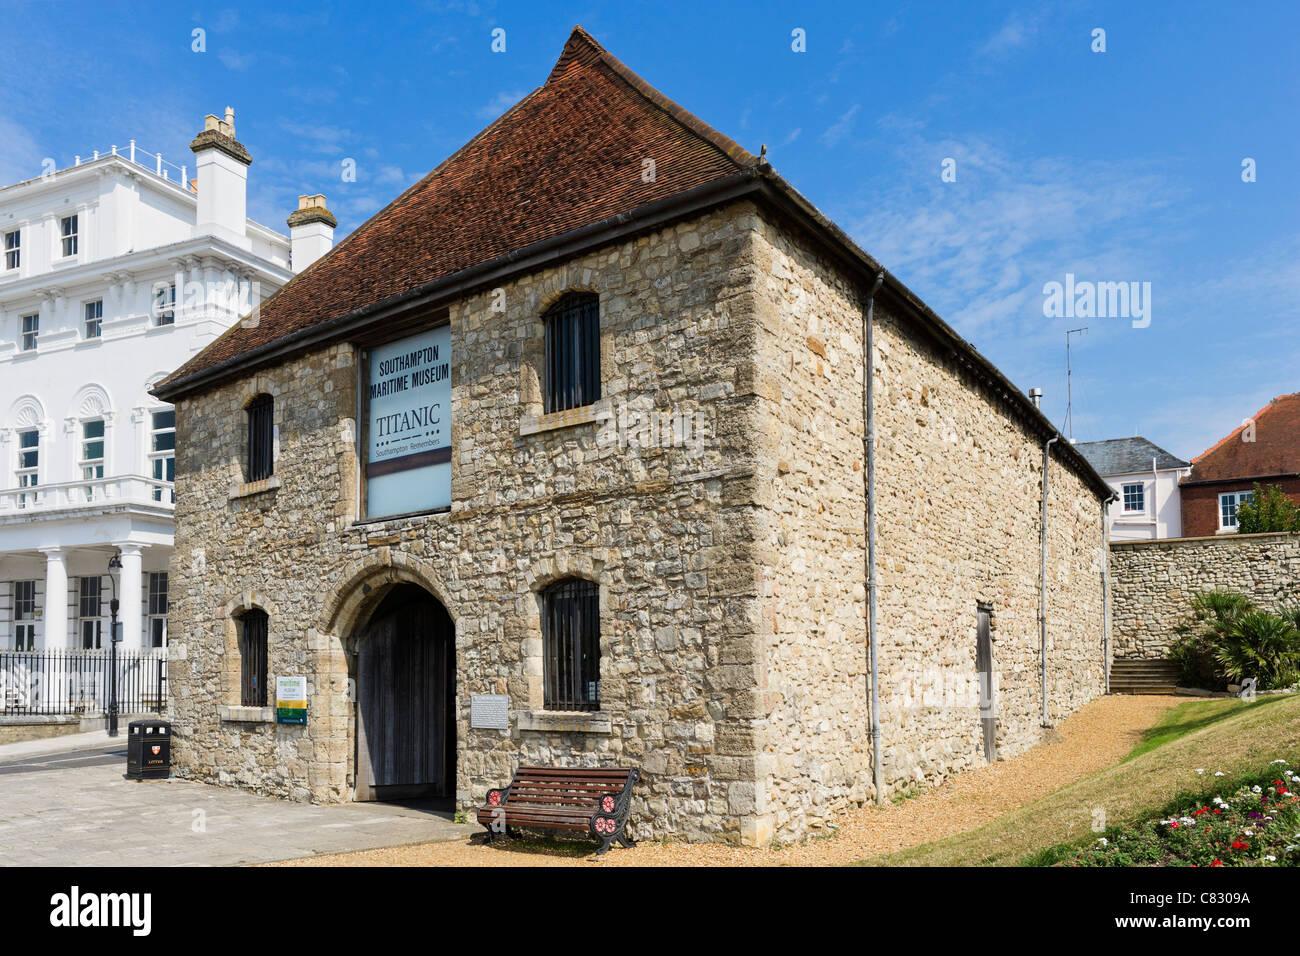 The Wool House, housing The Titanic Exhibition, Sothampton Maritime Museum, Southampton, Hampshire, England, UK - Stock Image